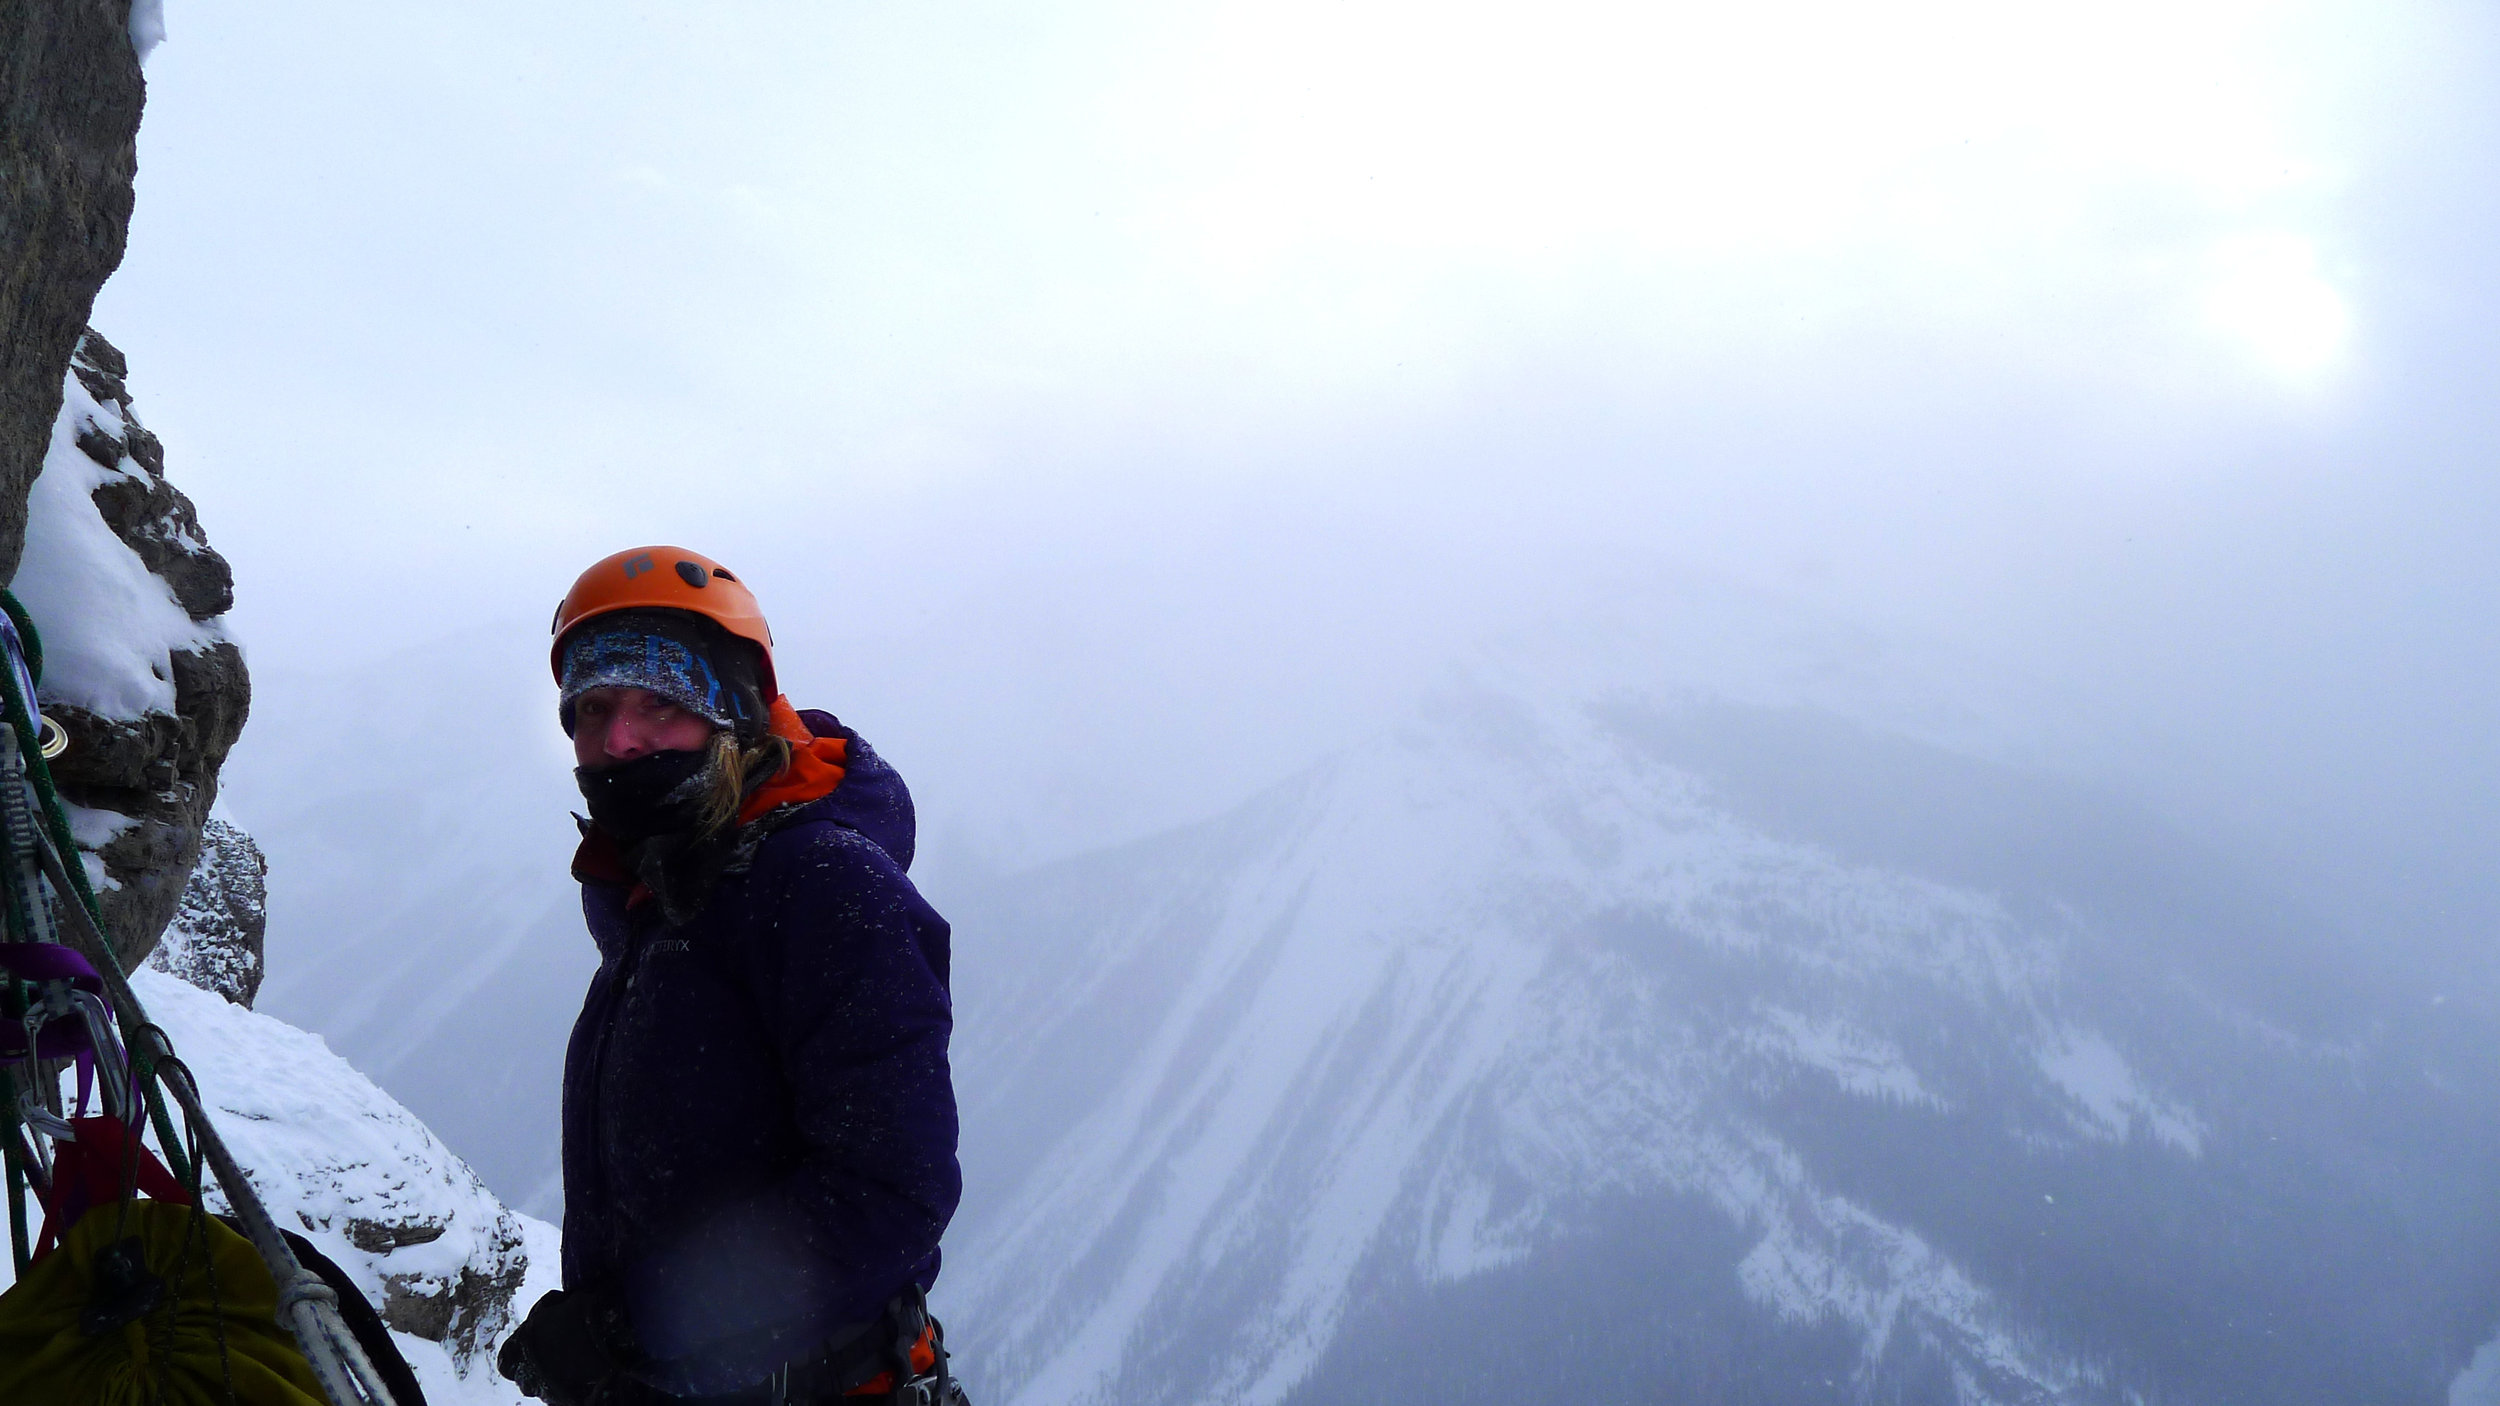 Tanja Schmitt on Bourgeau Left , -25Celsius, AB, Canada, December 2012 picture Matthias Scherer